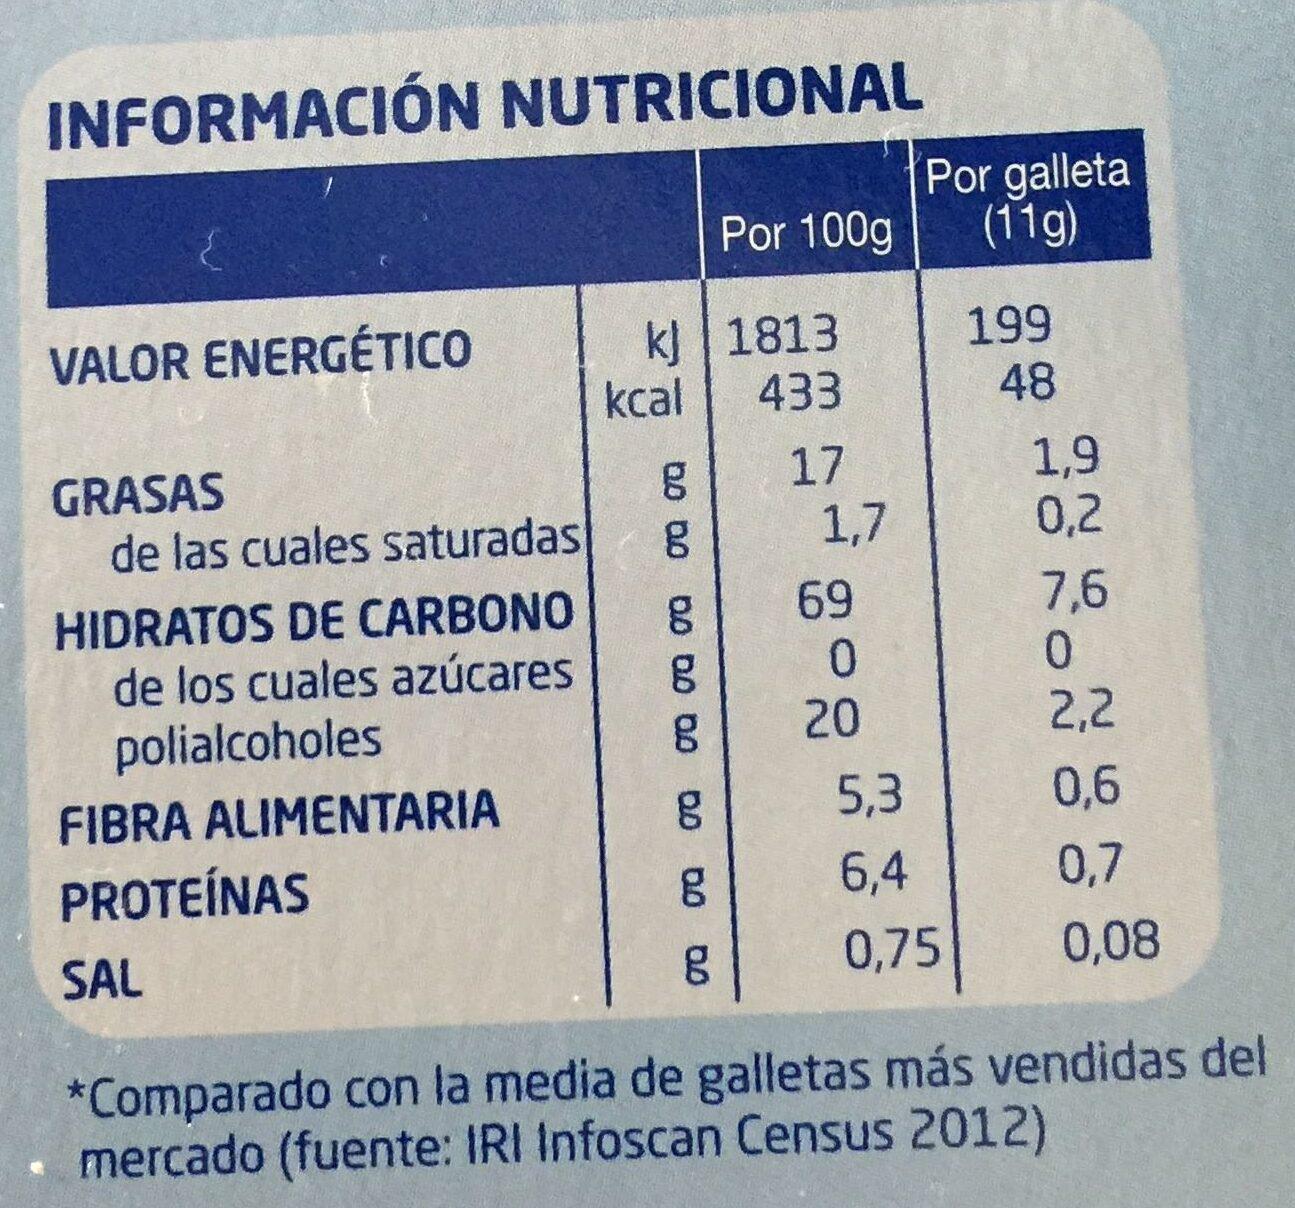 Galleta sésamo sabor vainilla sin azúcares - Información nutricional